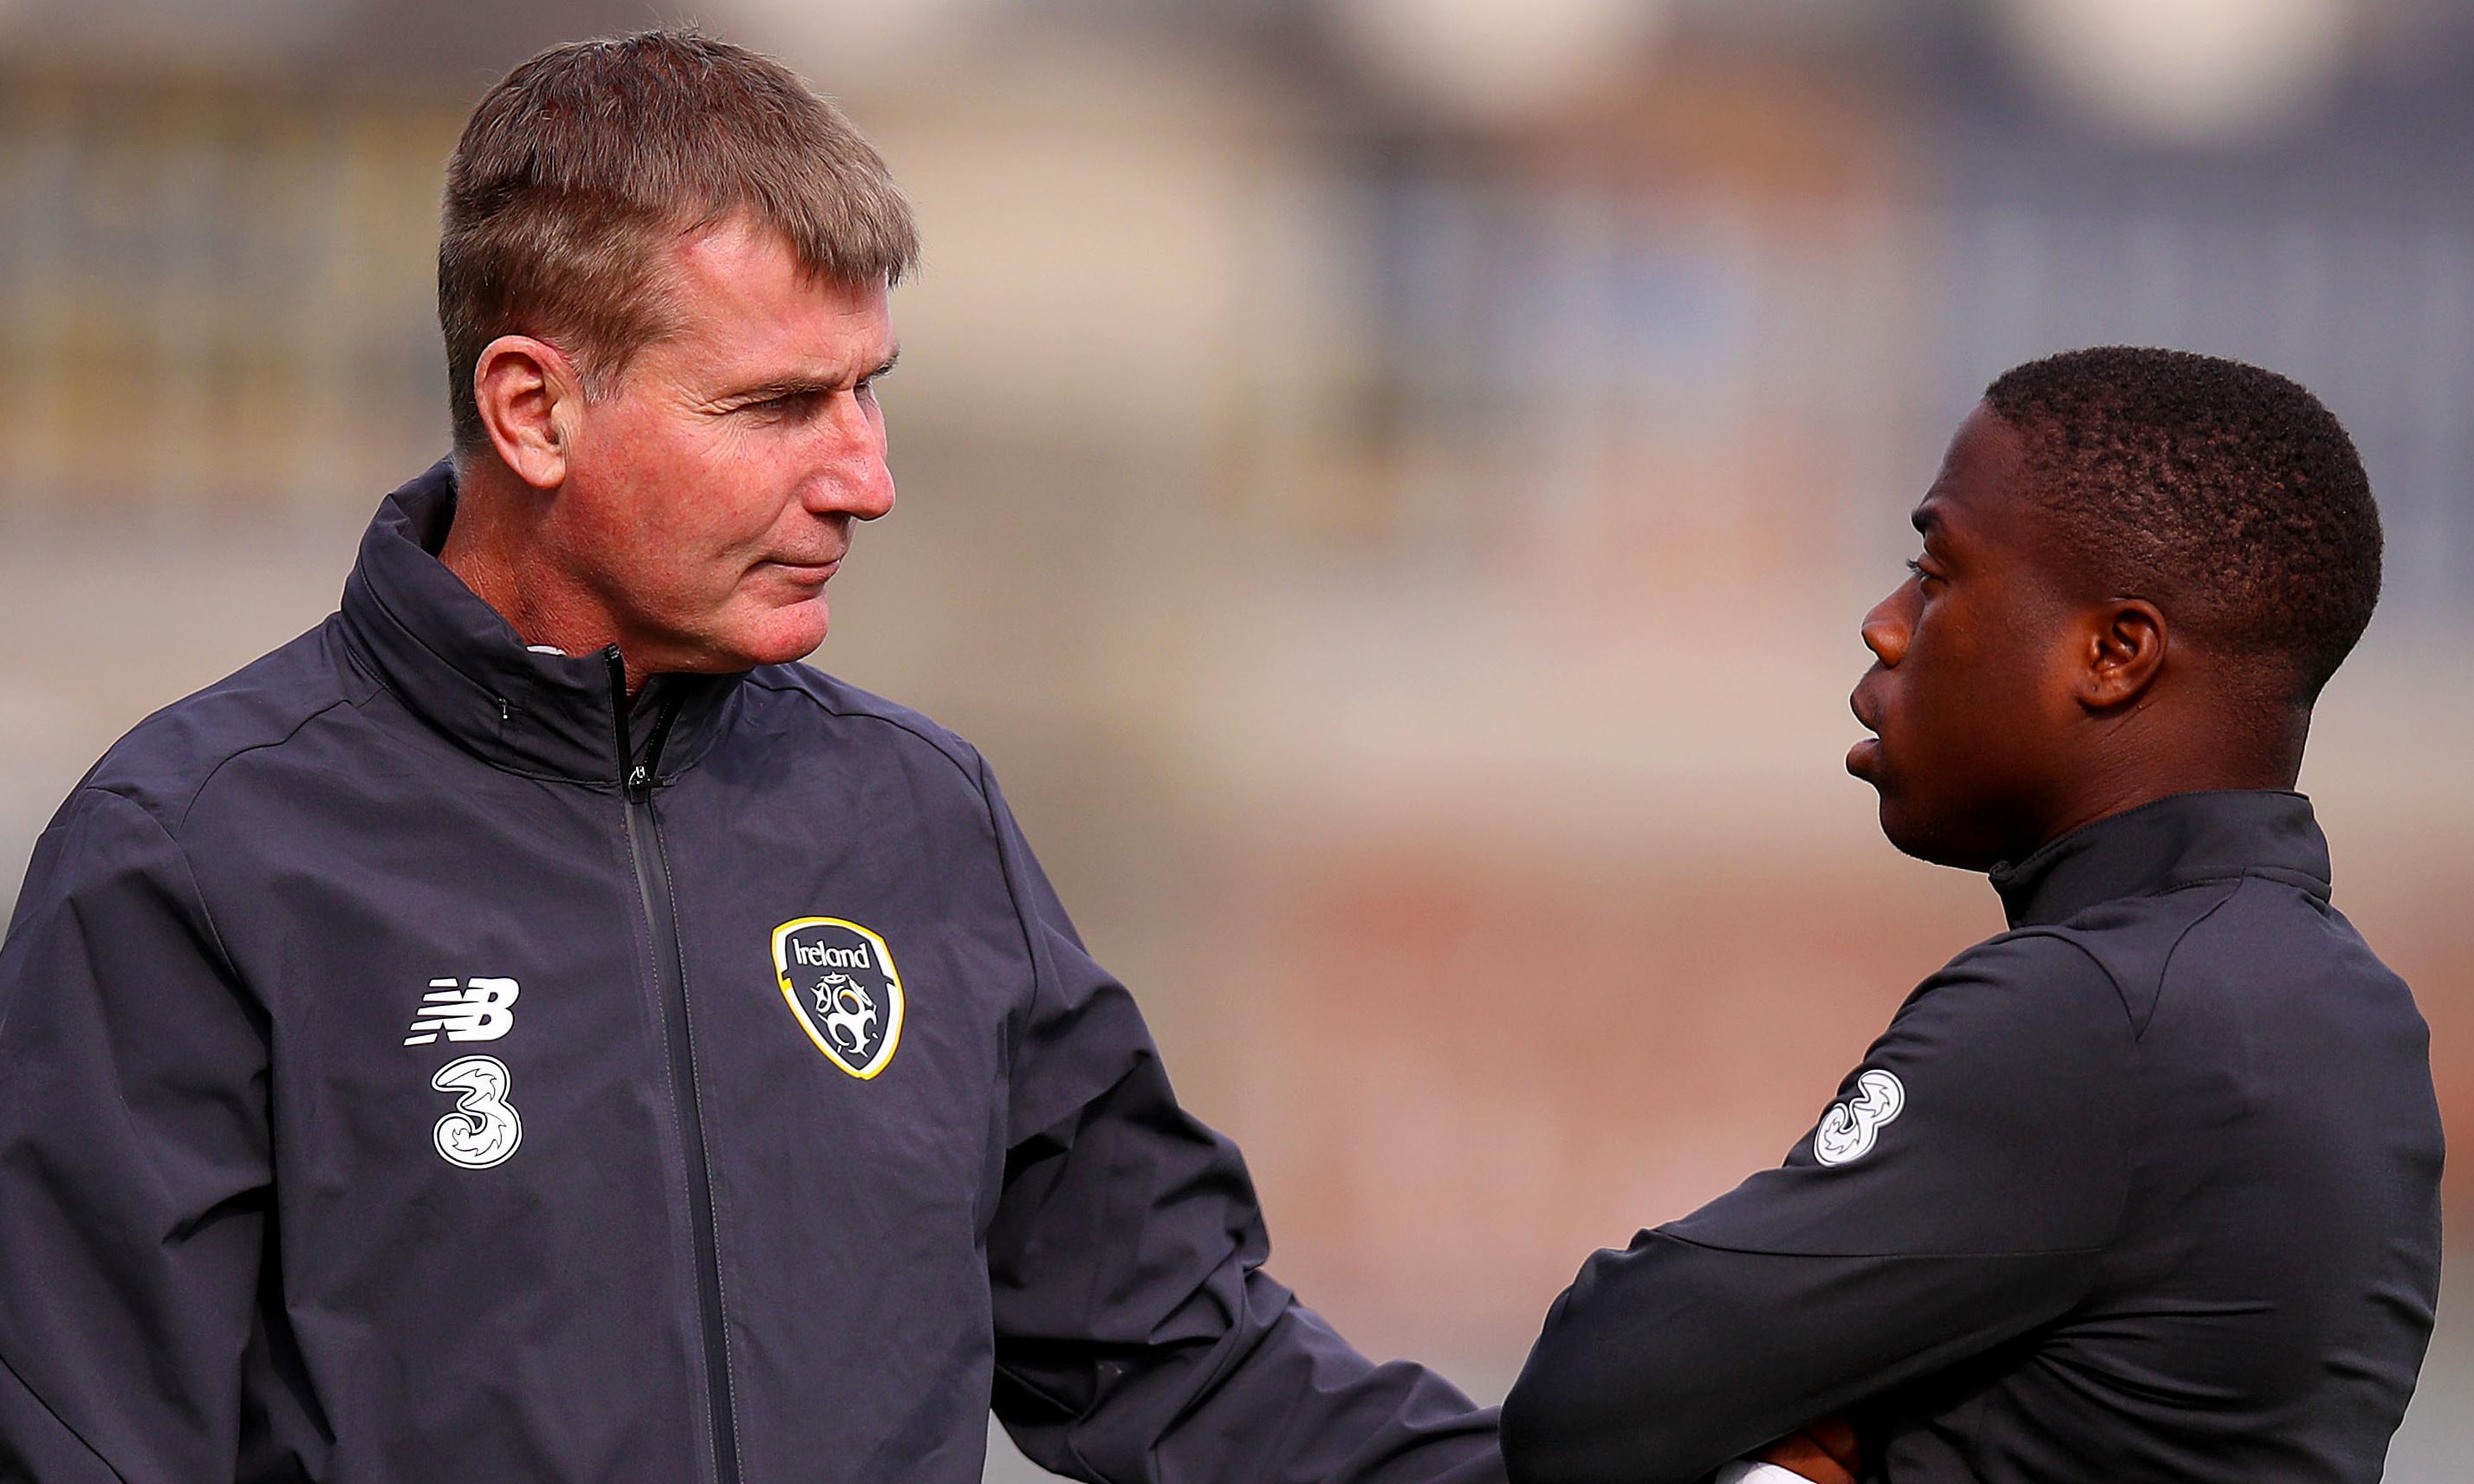 Stephen Kenny's golden touch still evident as he prepares for Ireland job